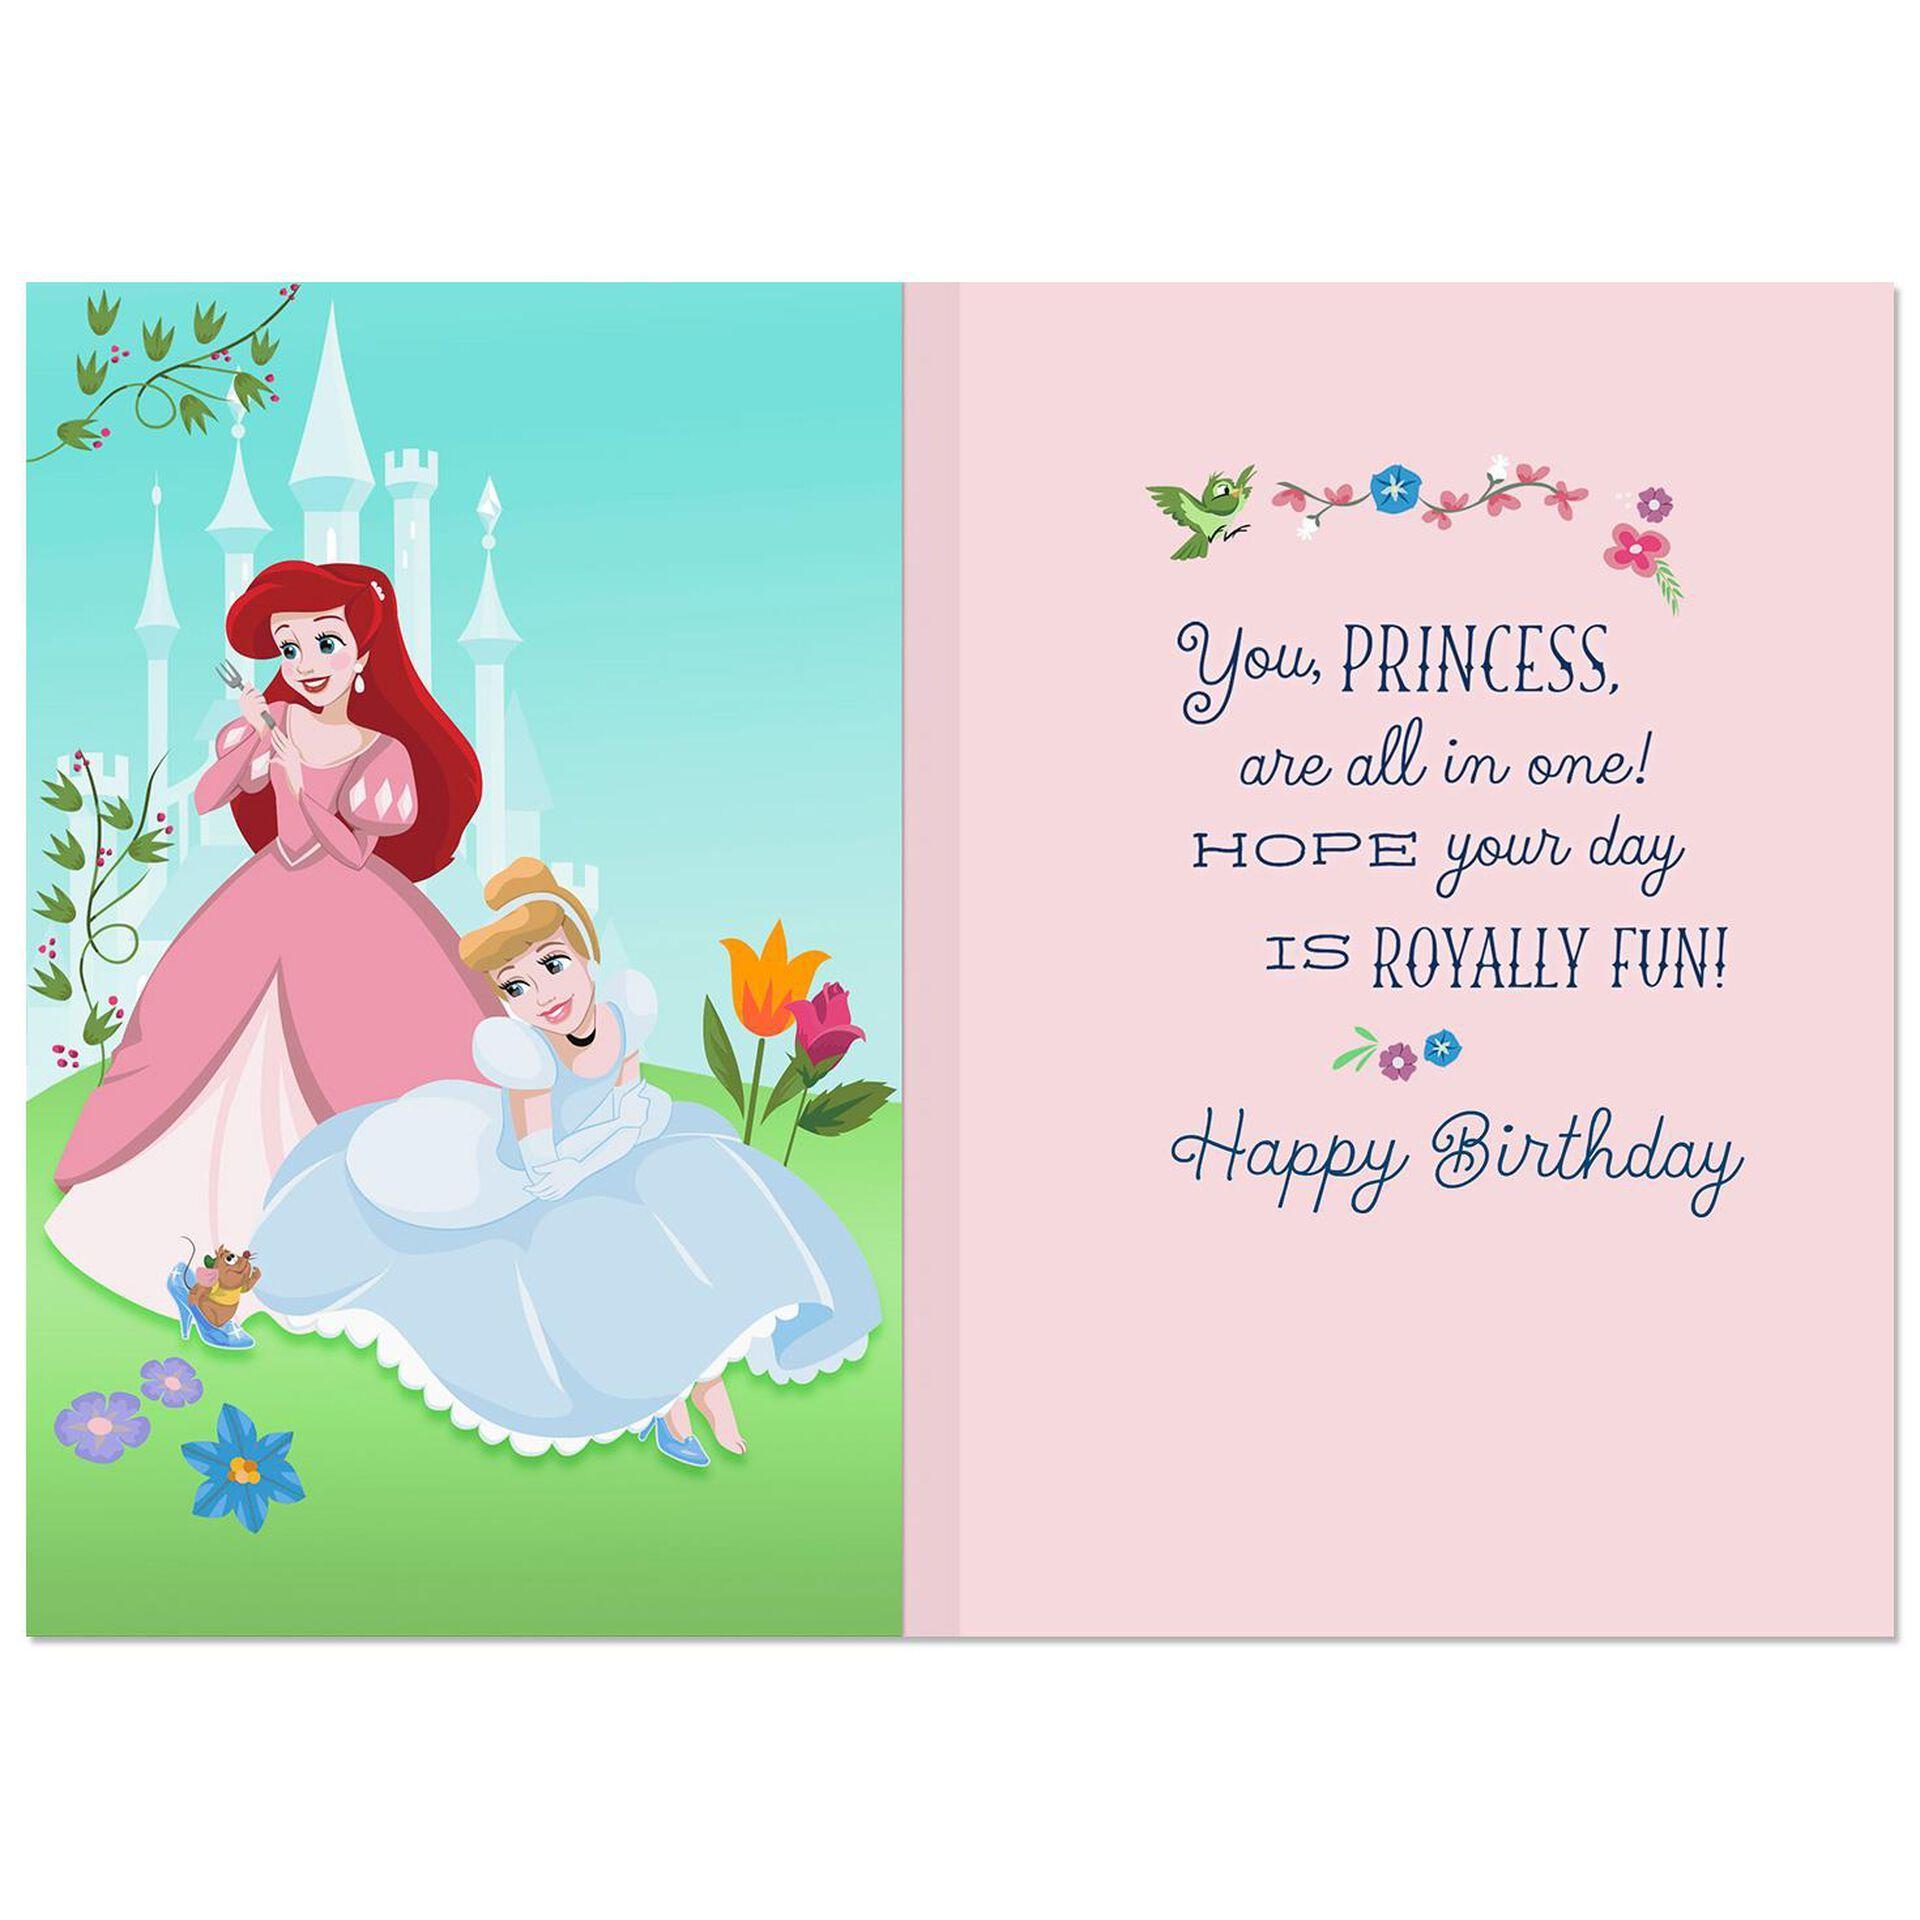 Disney Princesses Royally Fun Musical Birthday Card Greeting Cards Hallmark Musical Birthday Cards Birthday Cards Birthday Card Sayings